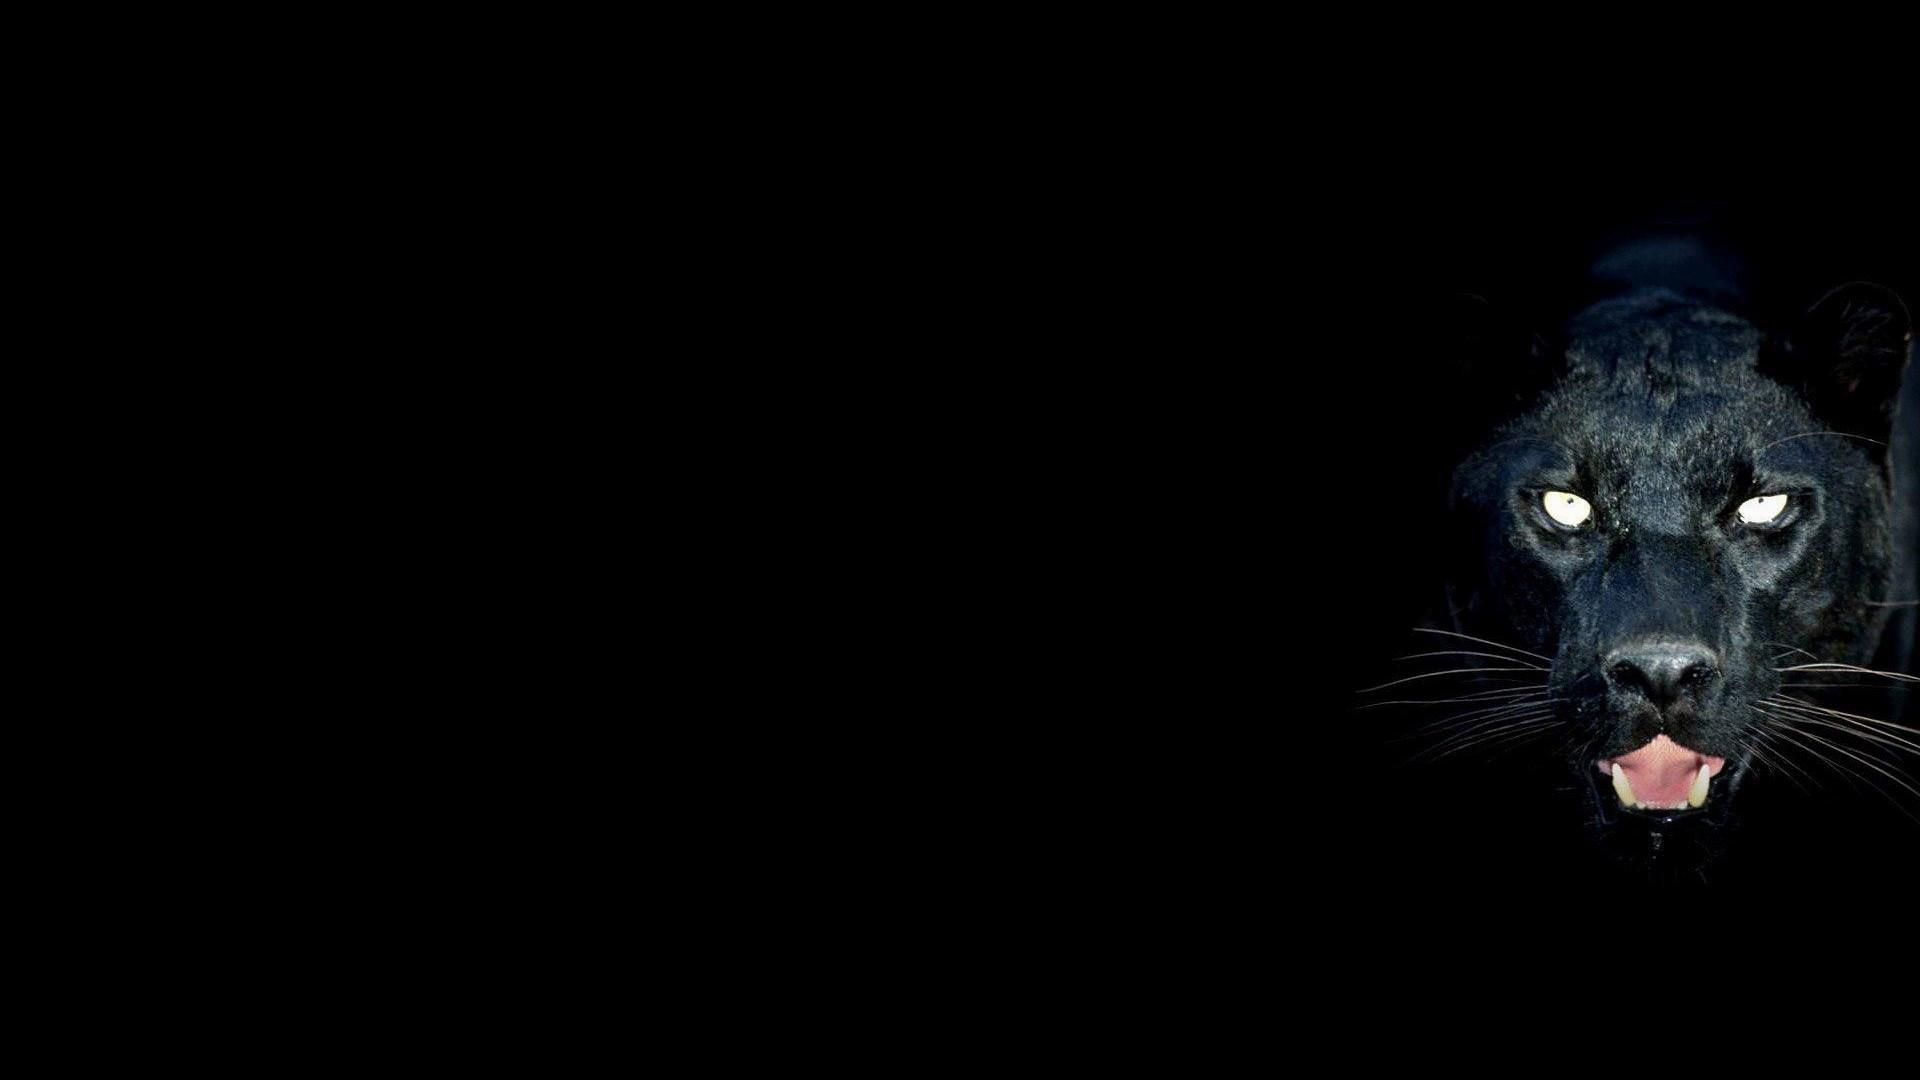 black-panther-image-Full-HD-Photos-1920-x-